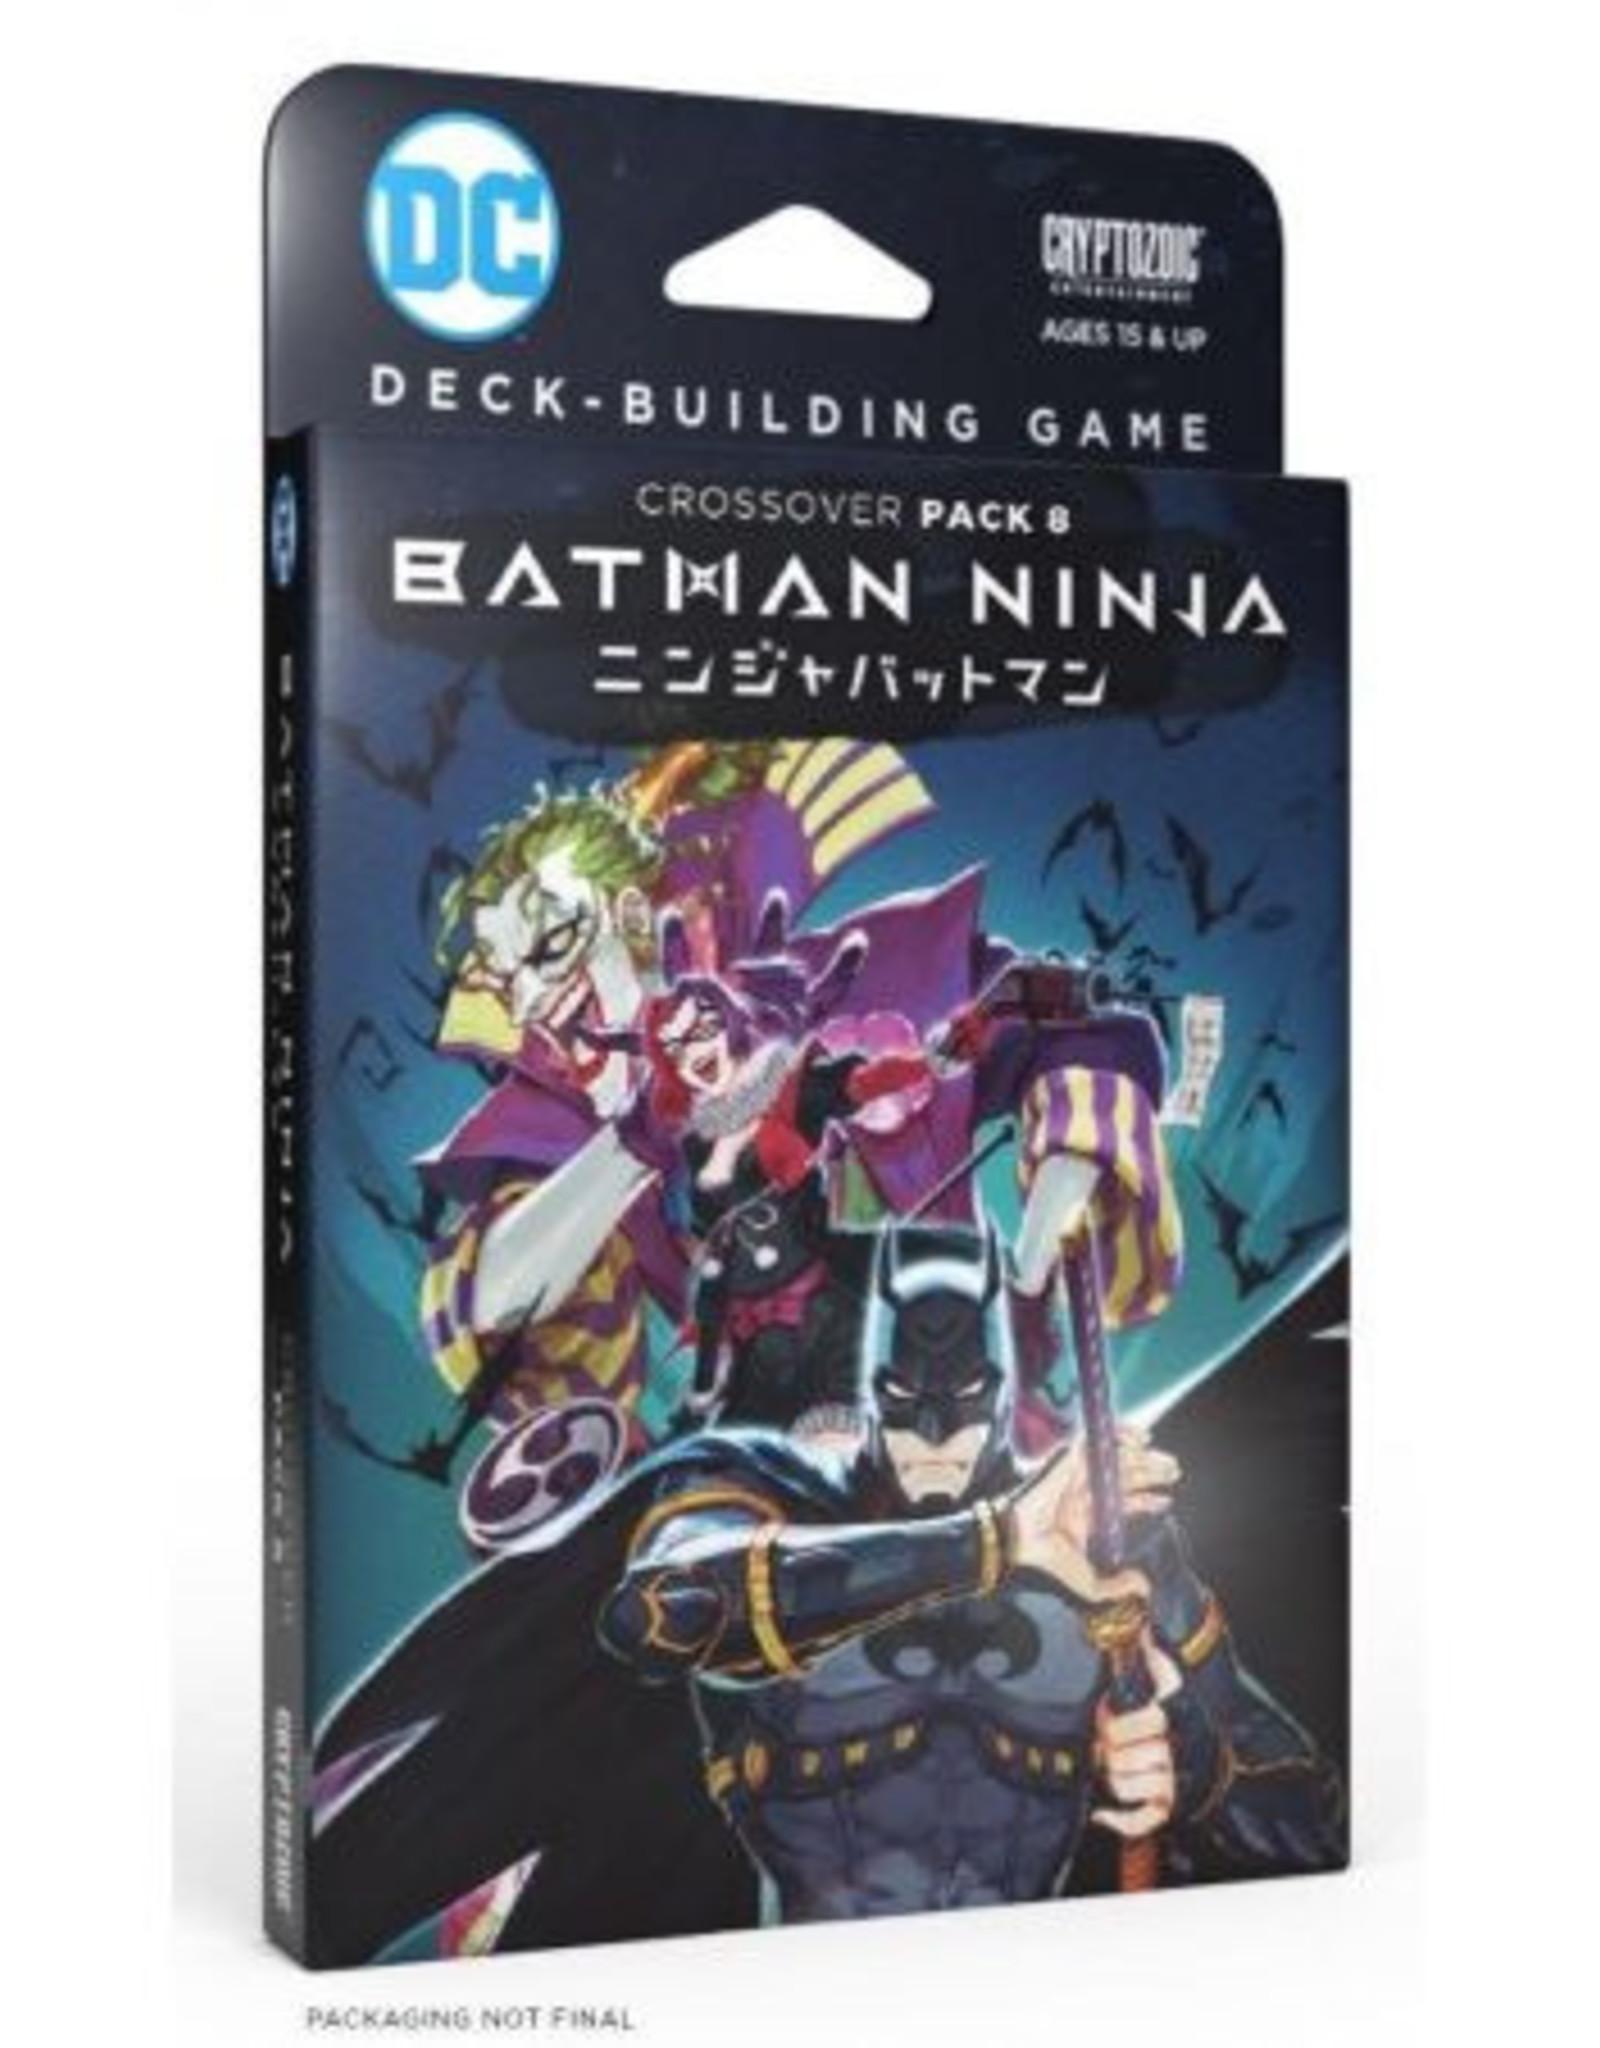 Cryptozoic Entertainment DC Comic - DBG: Crossover Pack 8 Batman Ninja